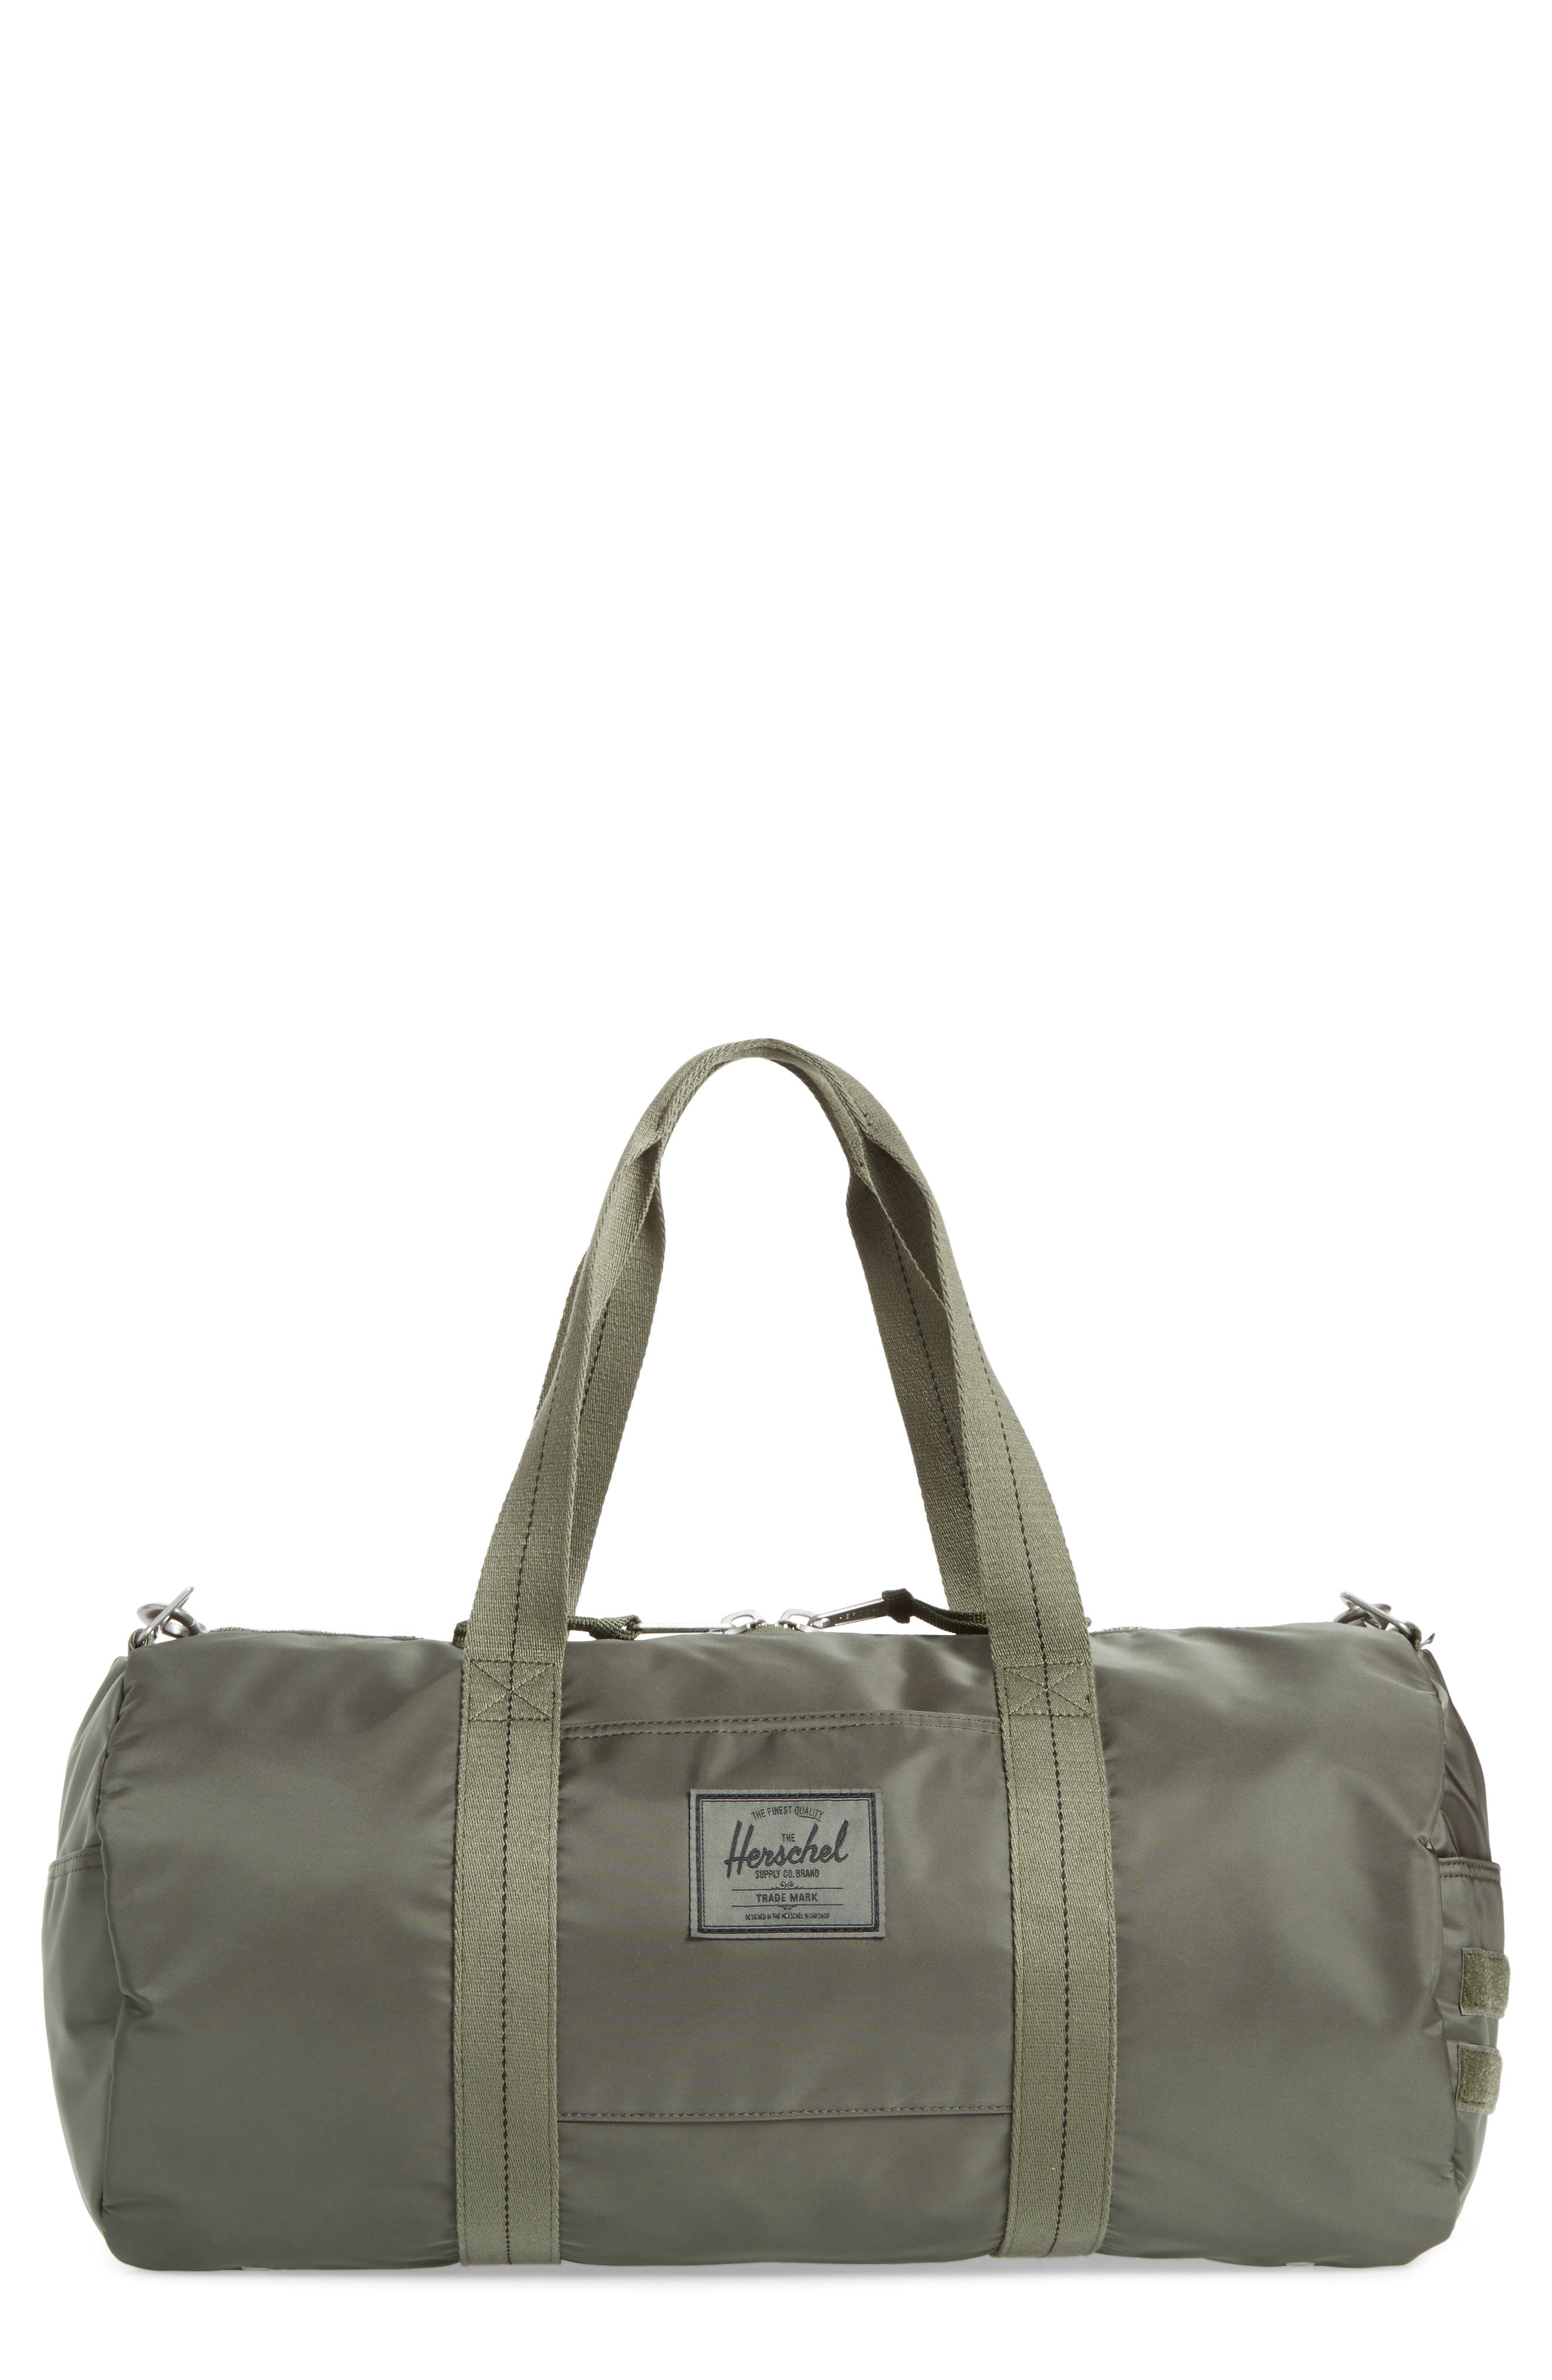 Alternate Image 1 Selected - Herschel Supply Co. Sutton Surplus Collection Duffel Bag